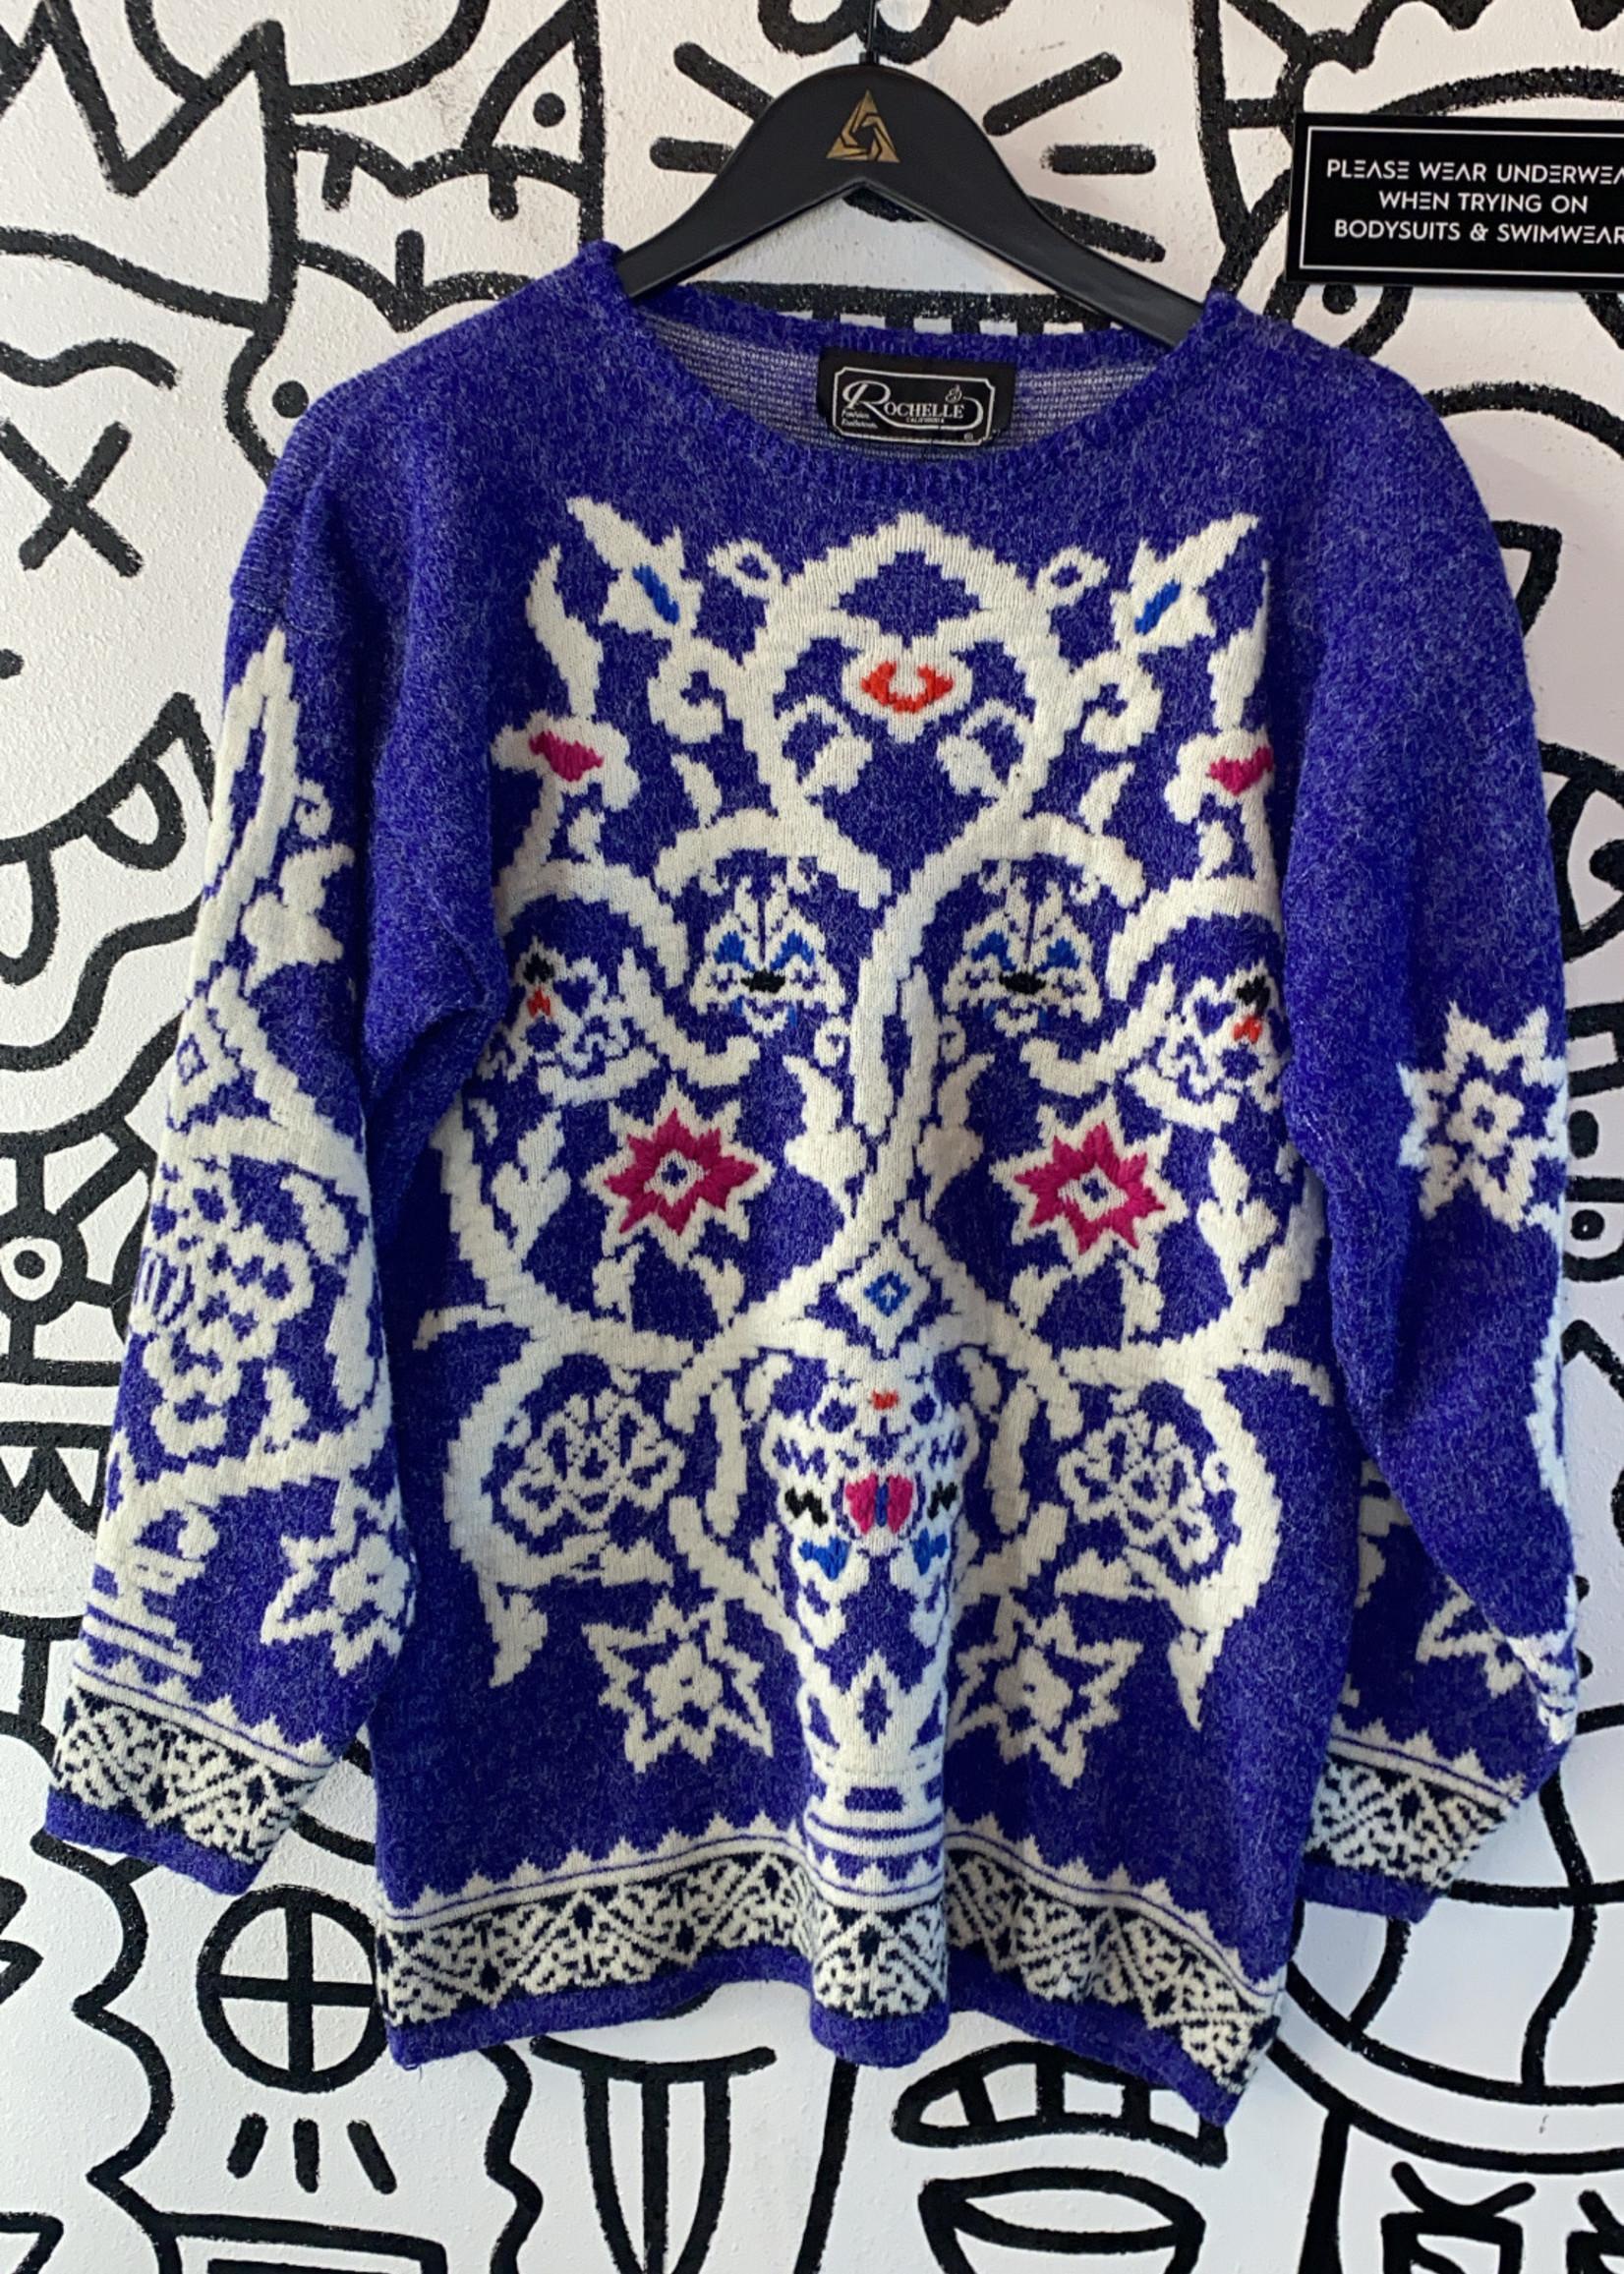 Rochelle California Purple Design Vintage Sweater M